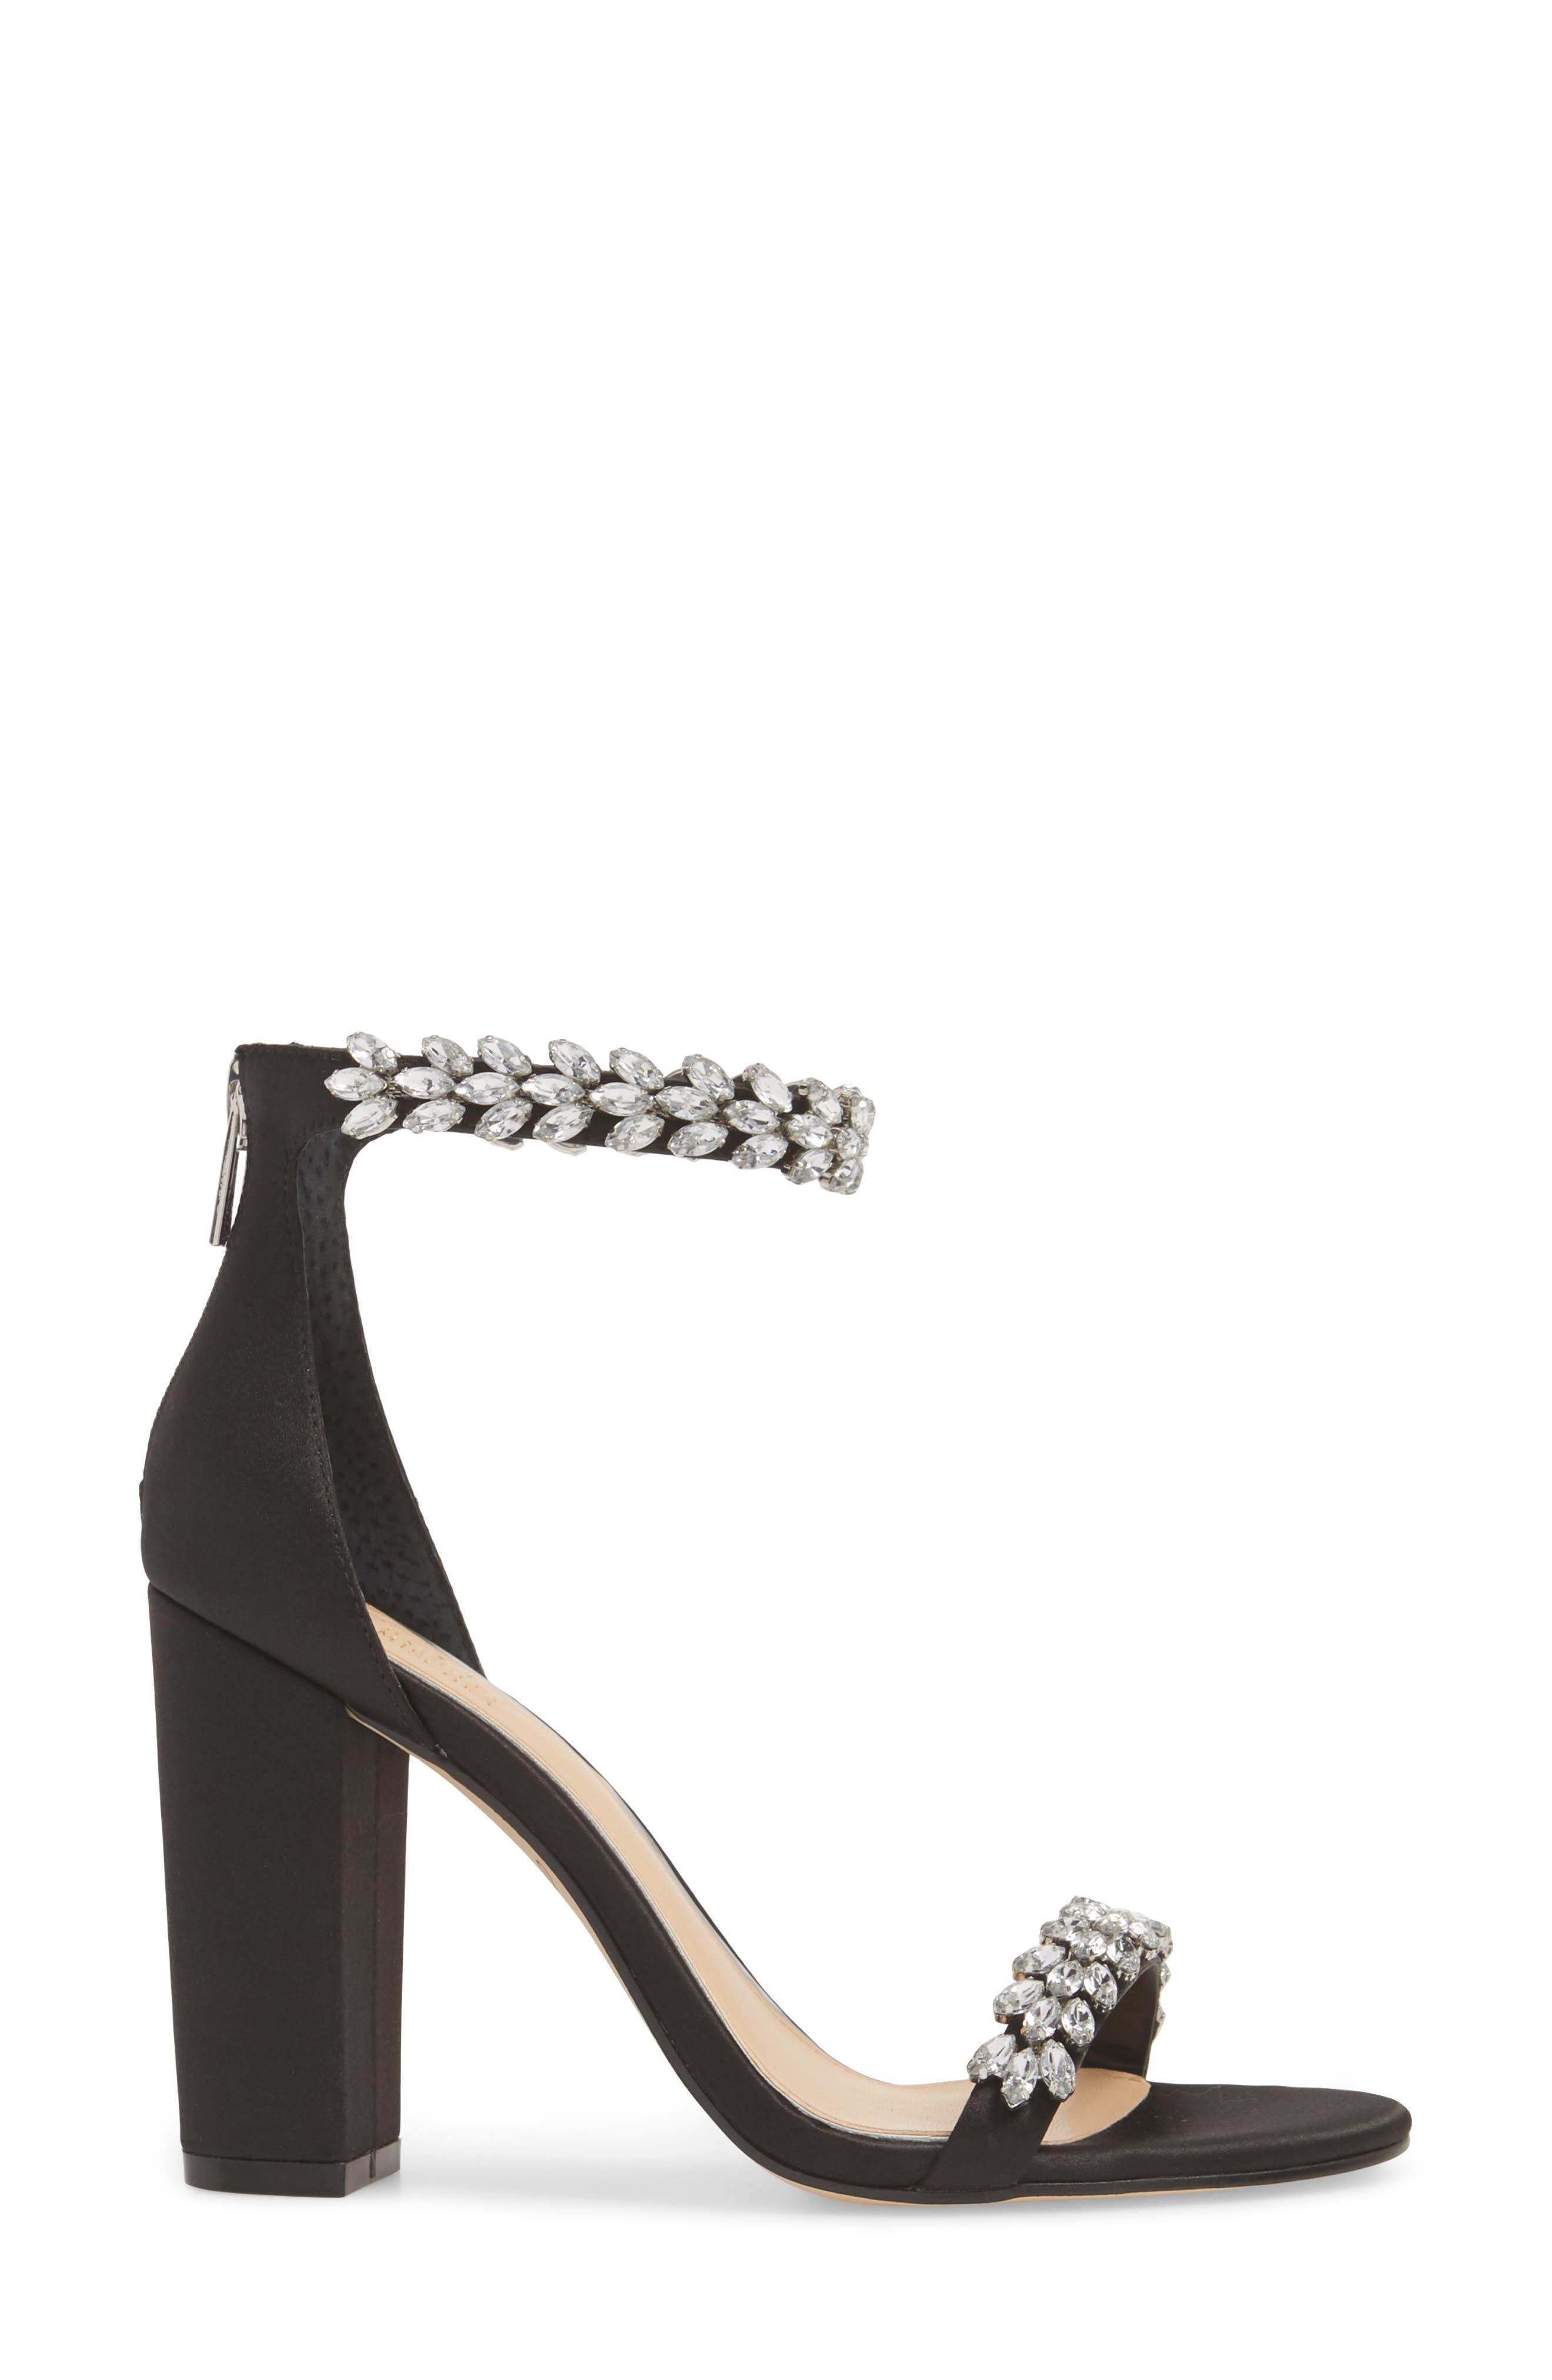 Jewel by Badgley Mischka Mayra Embellished Ankle Strap Sandal,                             Alternate thumbnail 3, color,                             BLACK SATIN